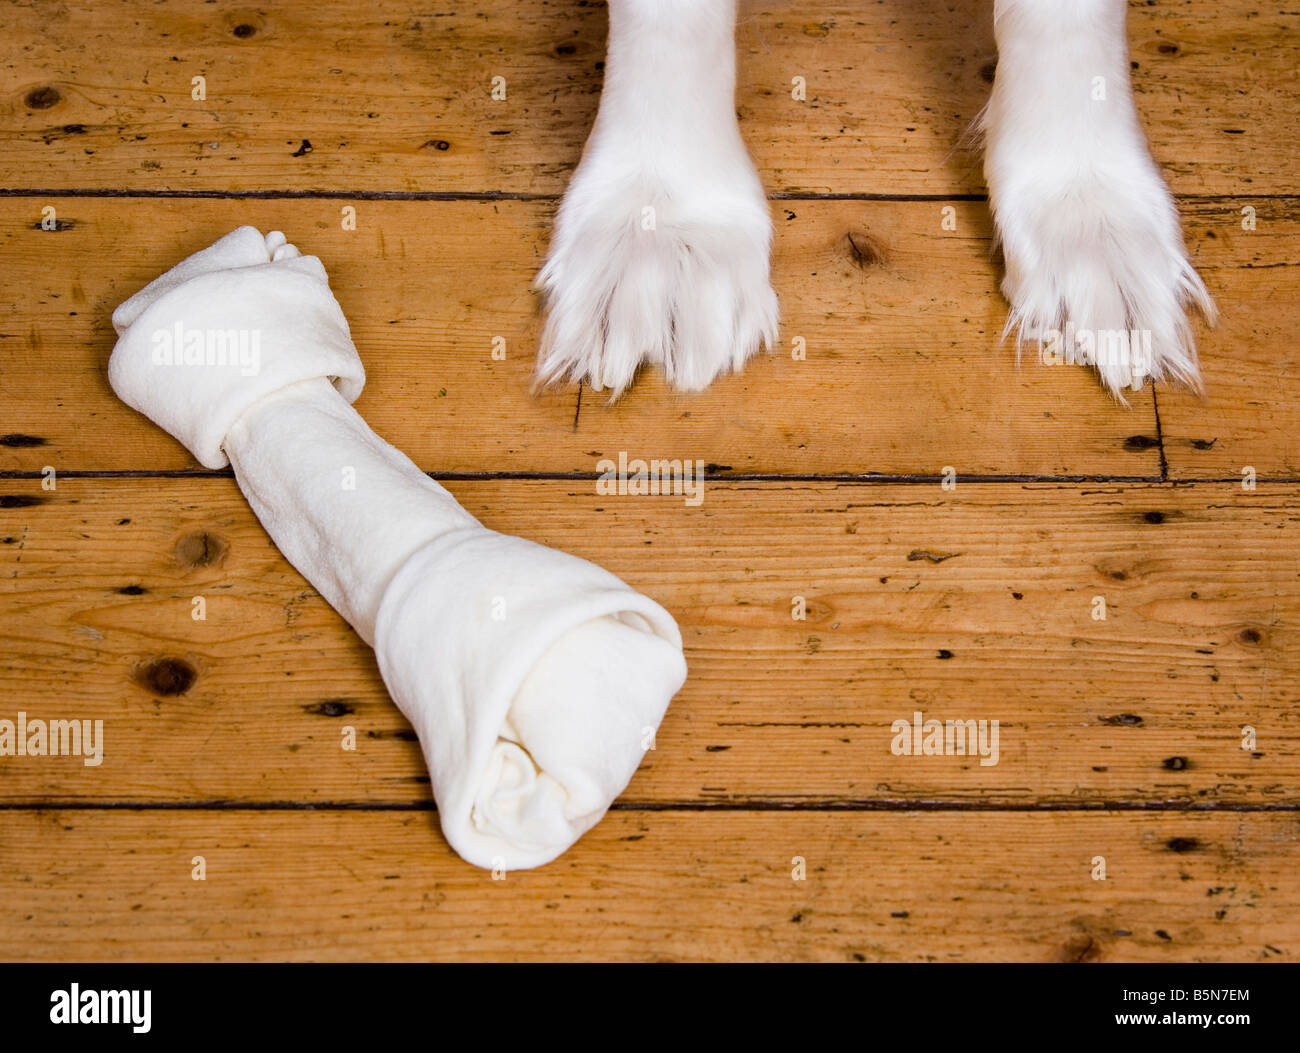 Feet of Borzoi and dog chew high angle view - Stock Image